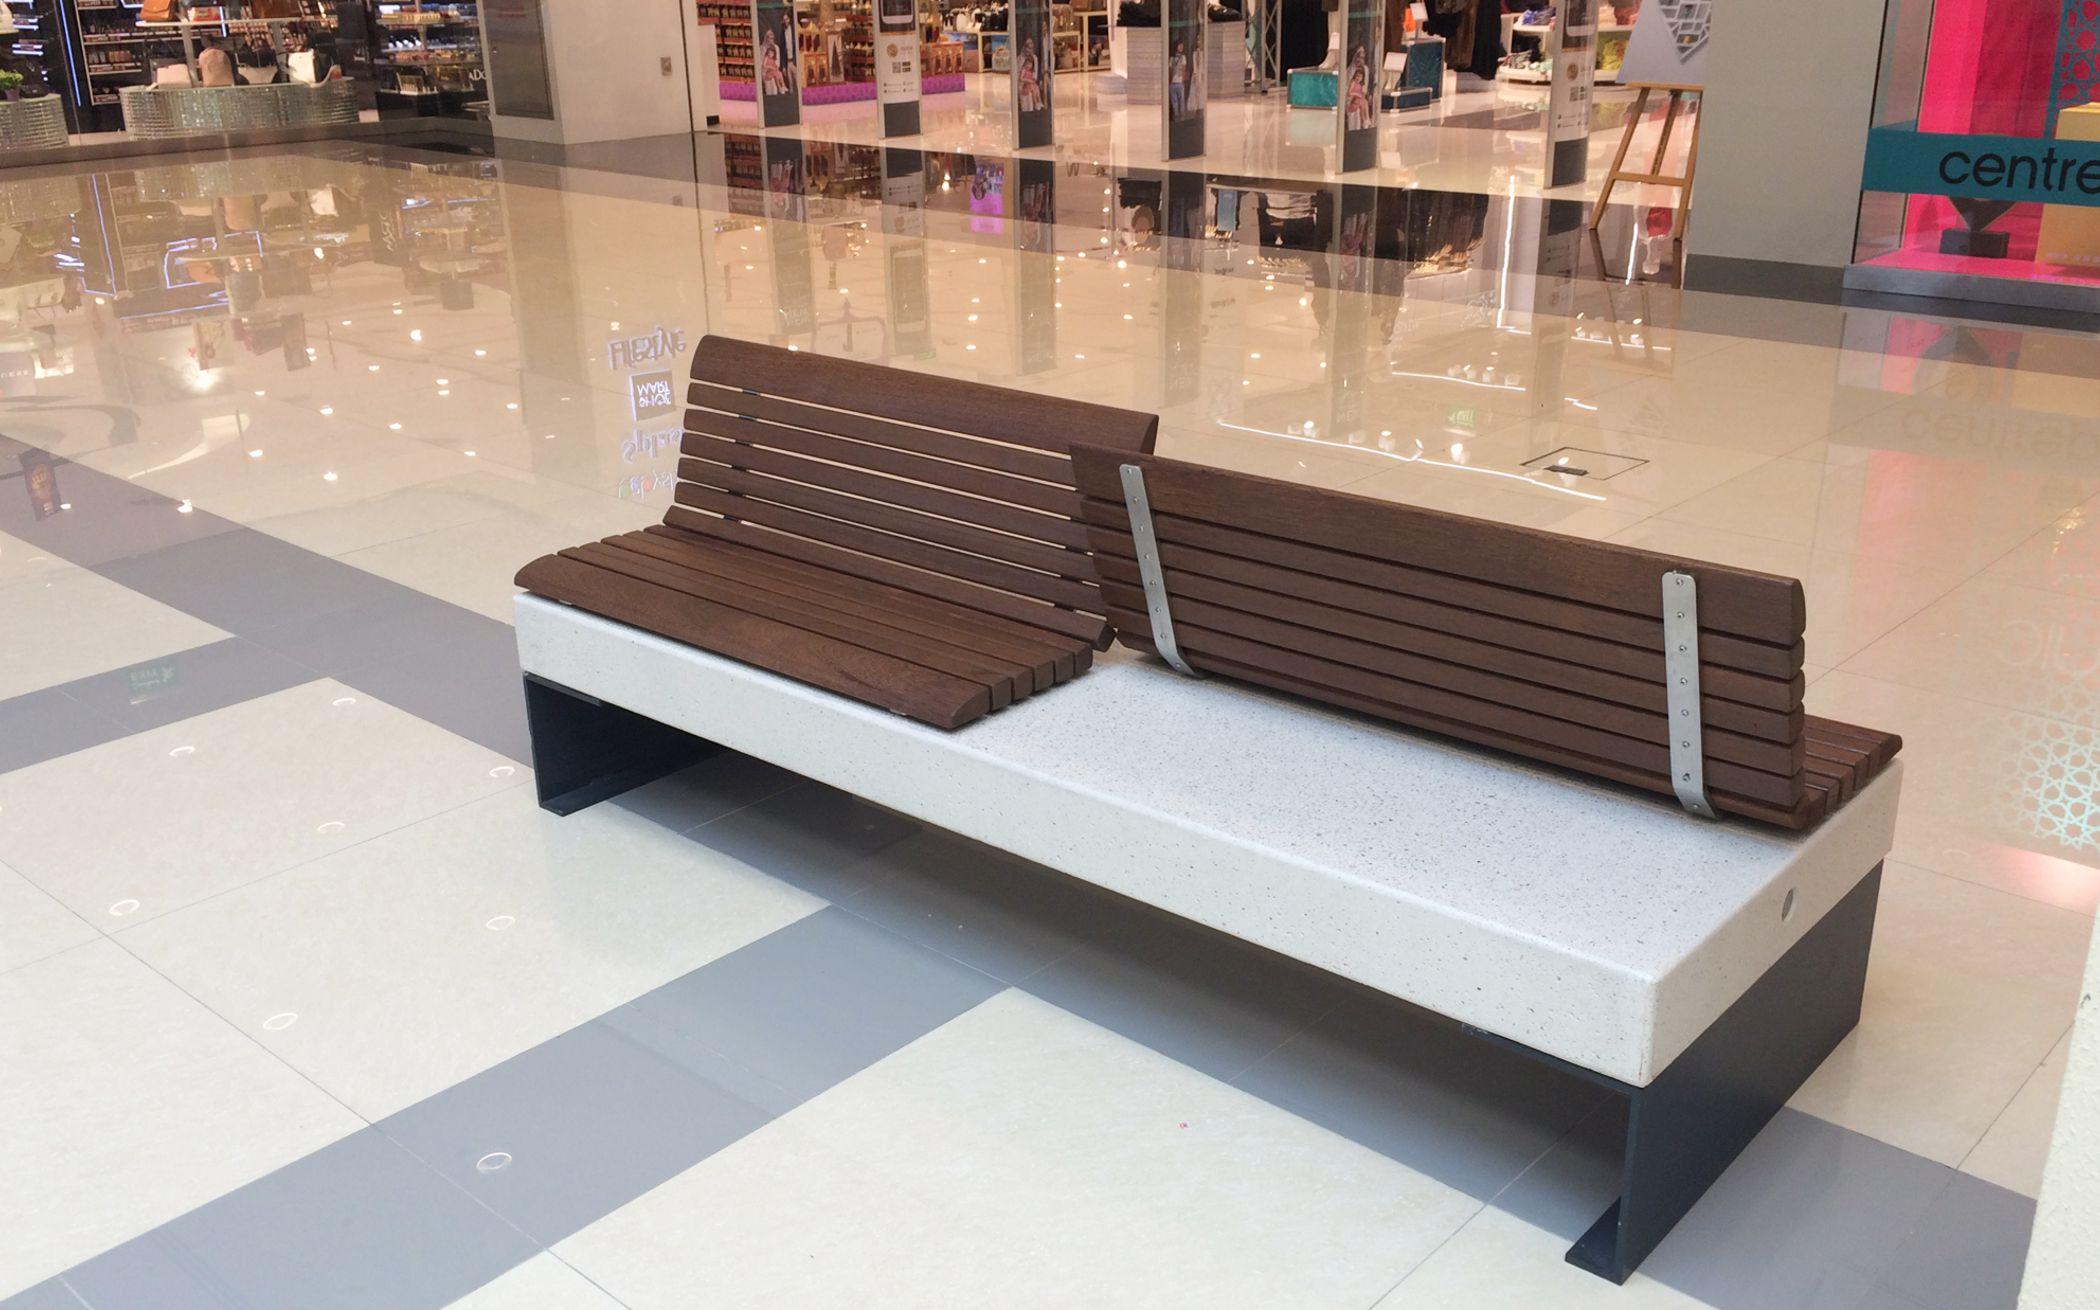 id created/metalco diamante seating